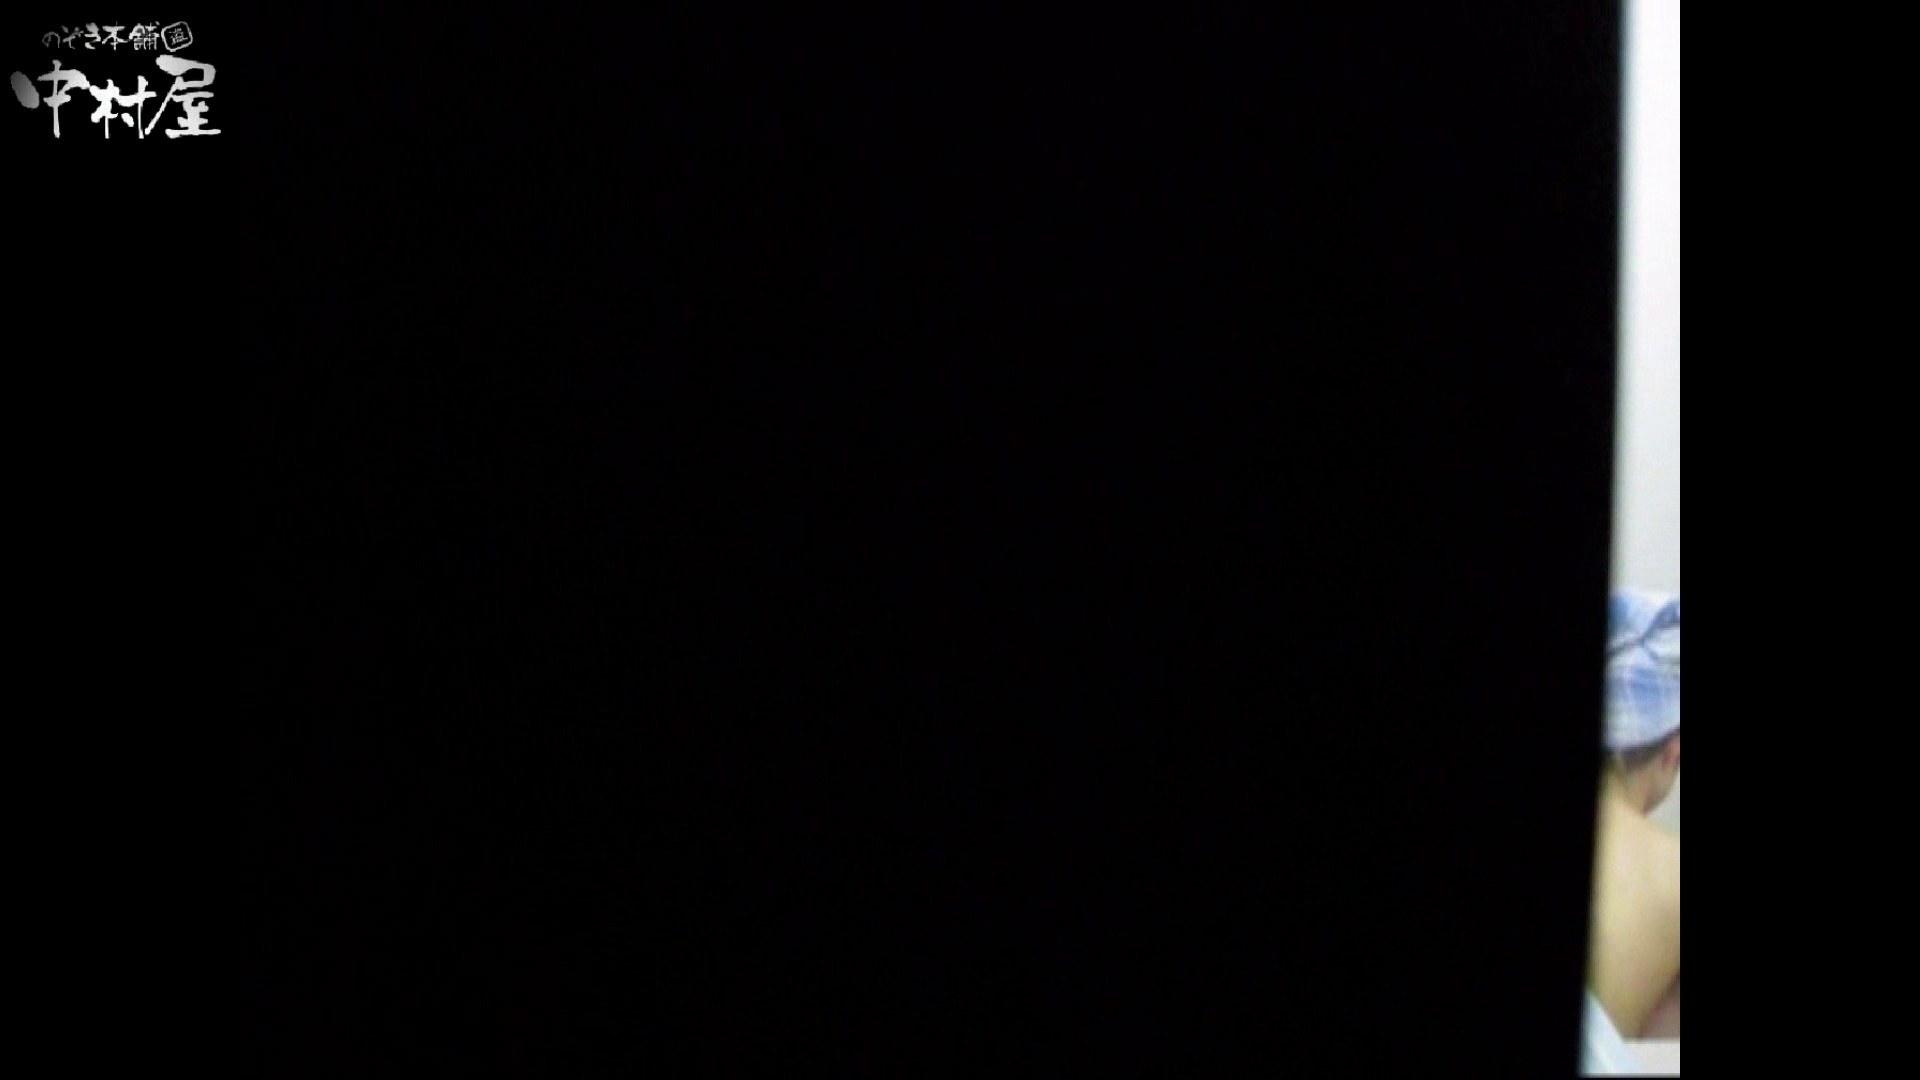 民家風呂専門盗撮師の超危険映像 vol.002 リアル股間  109Pix 46